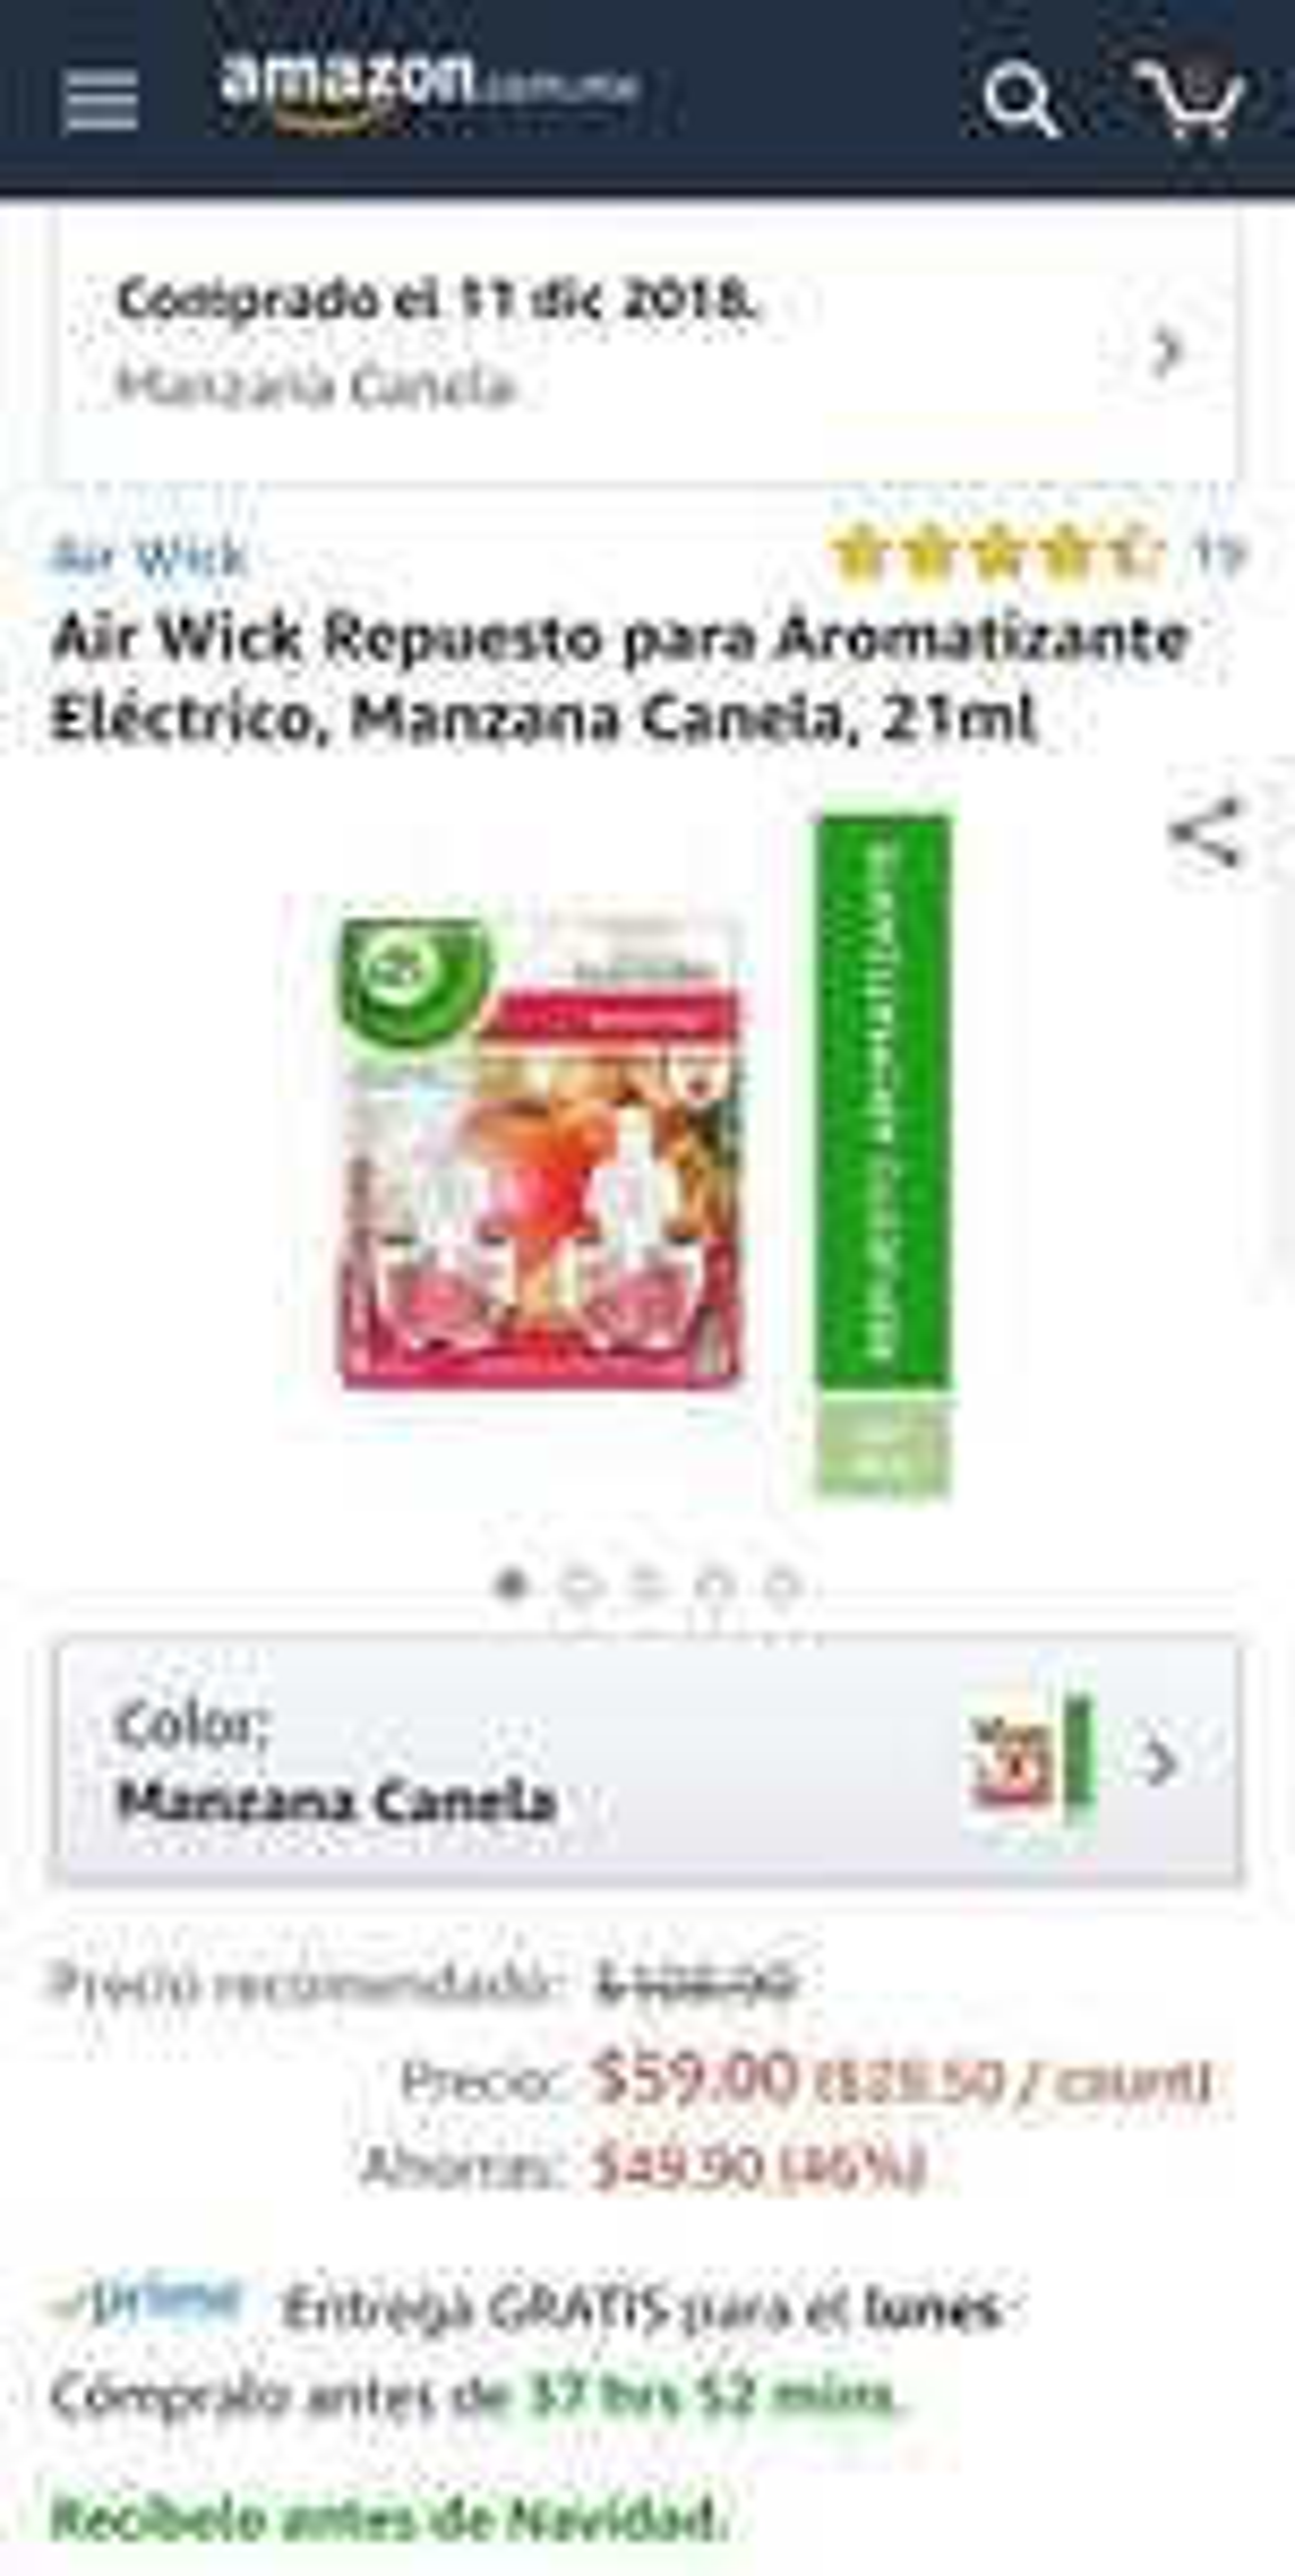 Amazon: Air Wick Repuesto para Aromatizante Eléctrico, Manzana Canela, 21ml